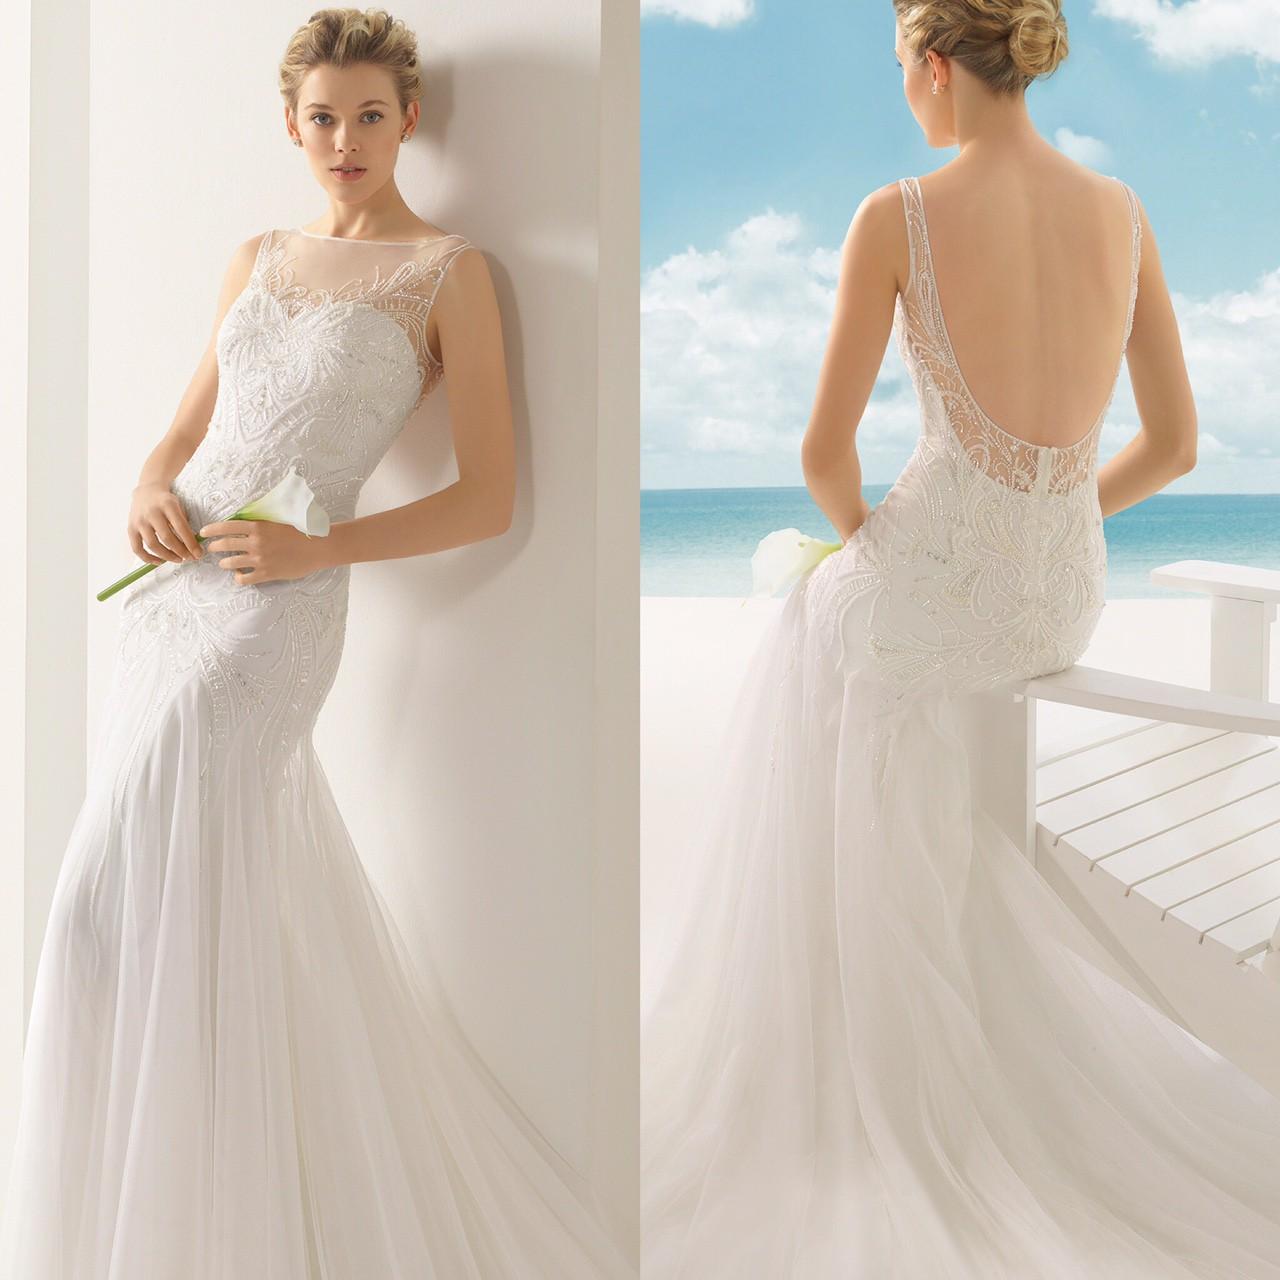 Rosa Clara Volga Preowned Wedding Dress On Sale 61% Off